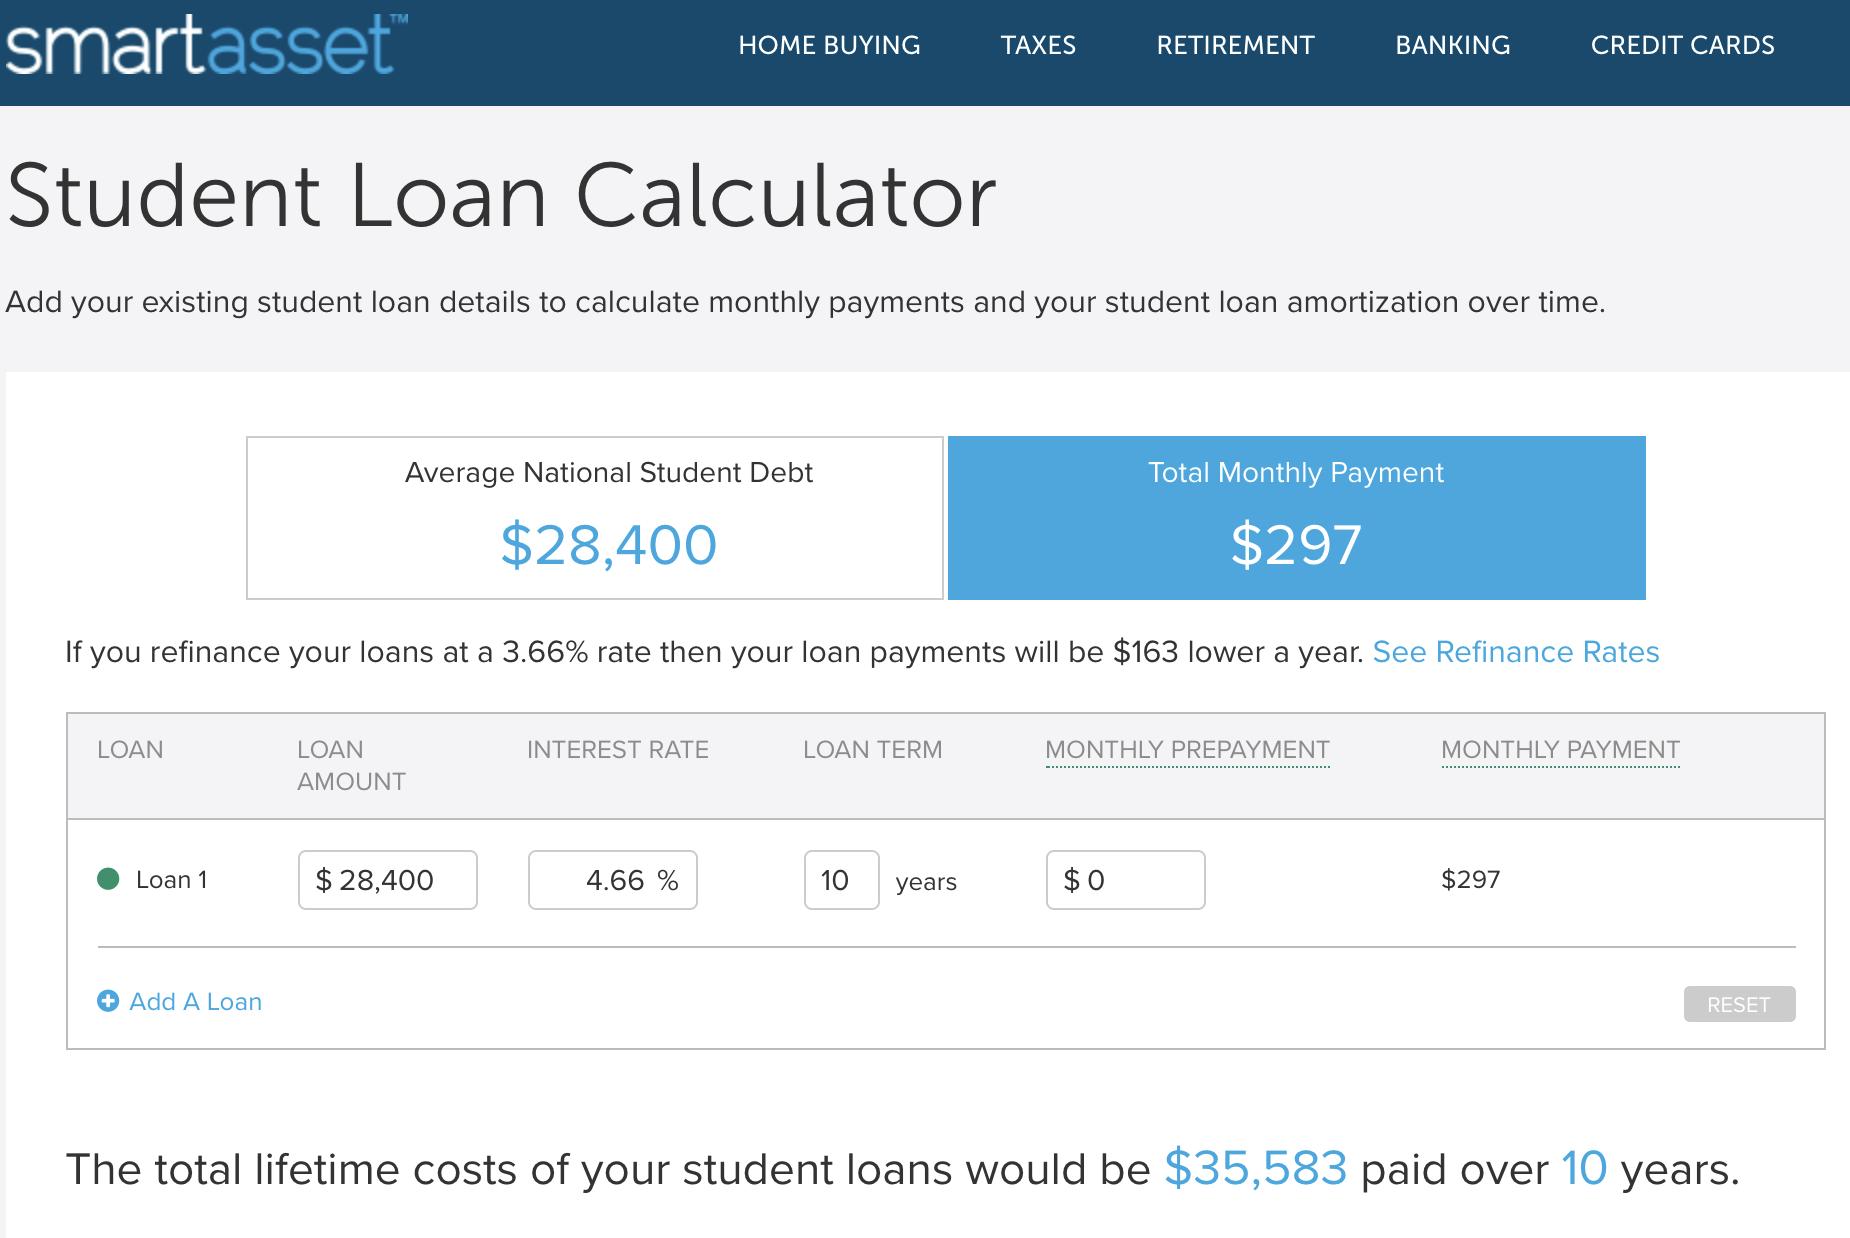 Student loan calculator screenshot